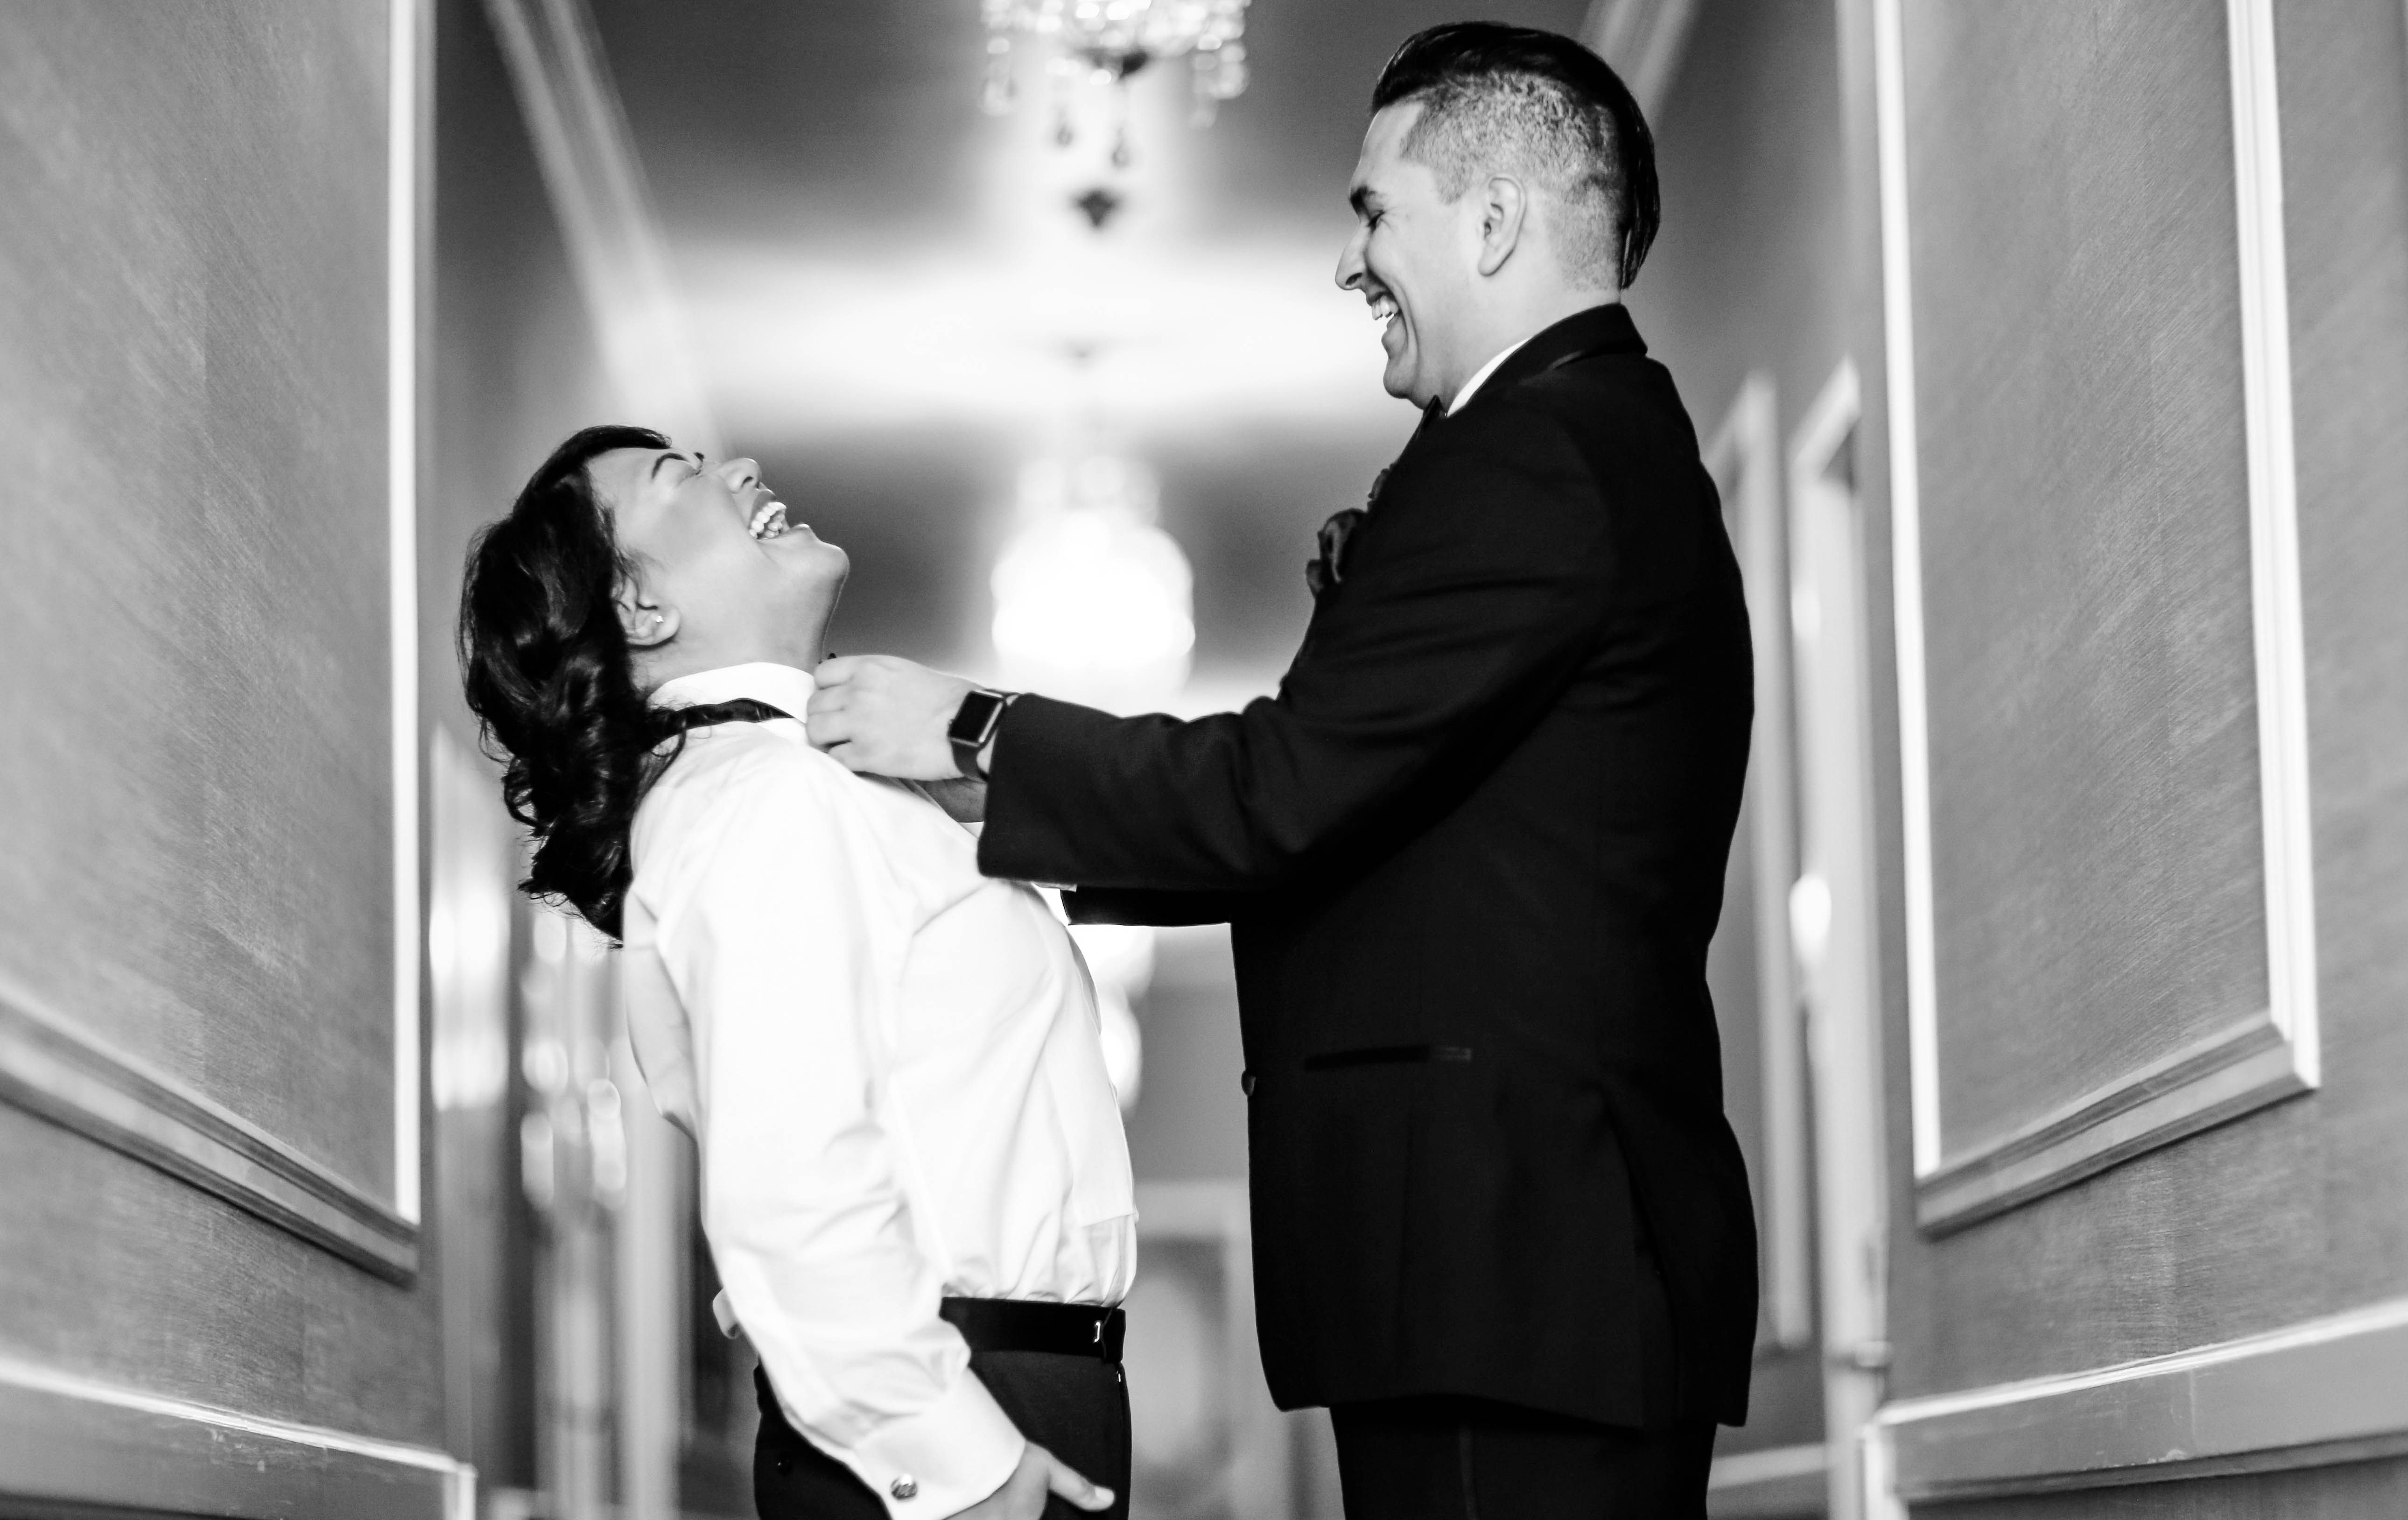 #weddingvenue #sacramentoweddingphoto #sacramentophotography #sacramentovideography #sacramentomediateam #sacramentoweddingdj